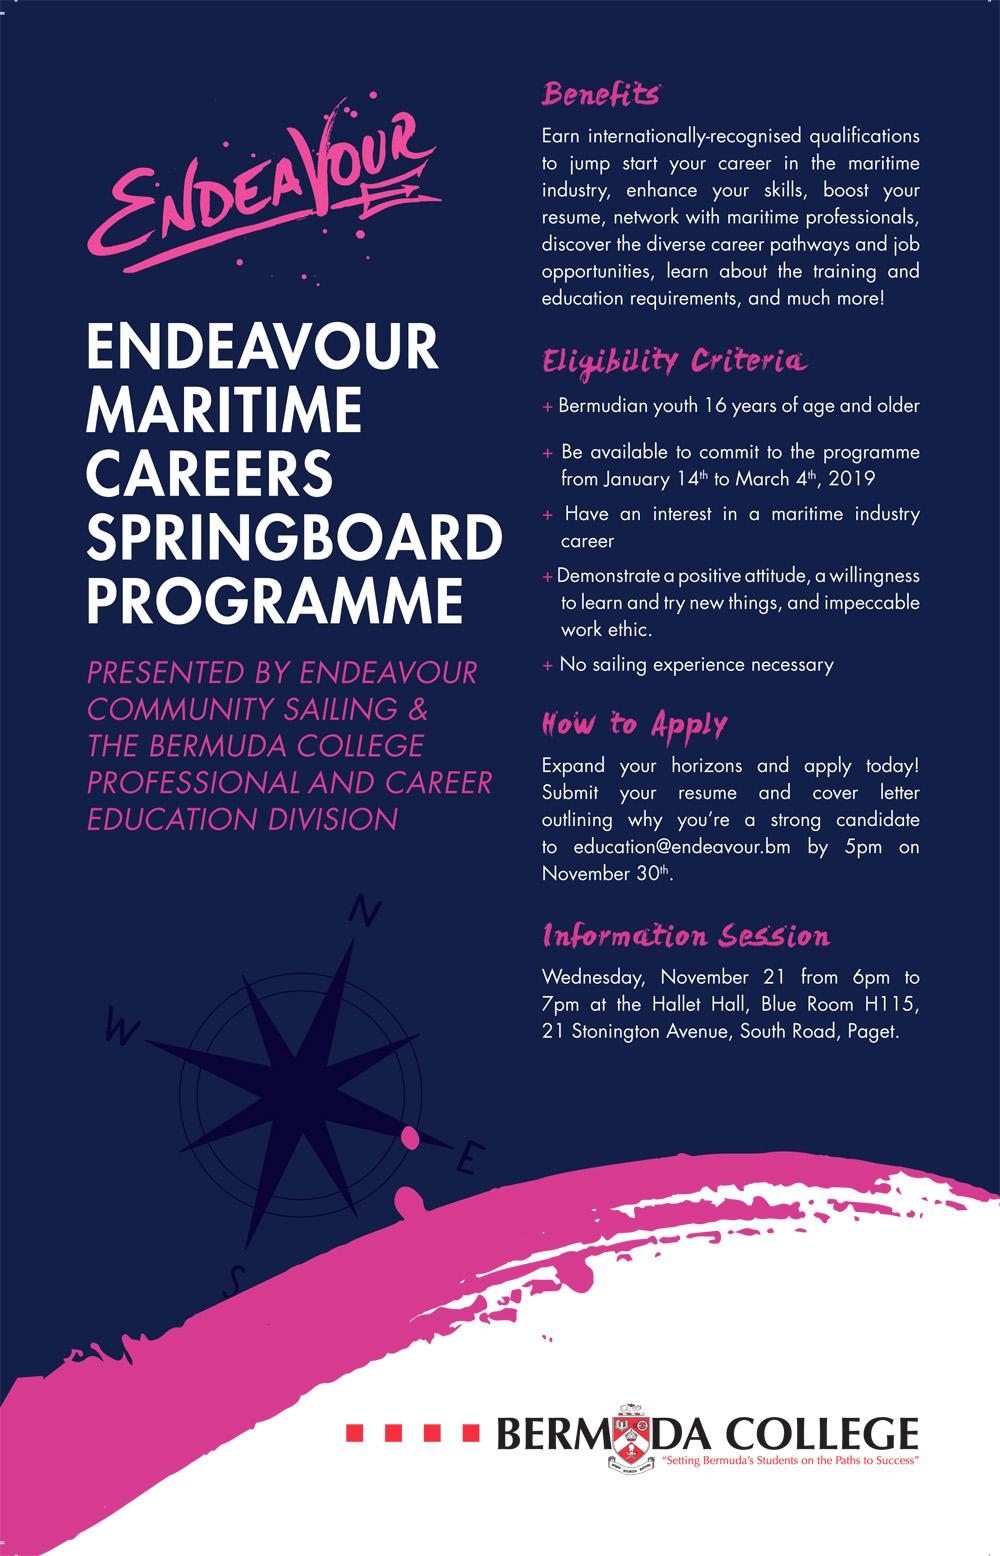 Endeavour Maritime Careers Springboard Programme Bermuda Nov 2018